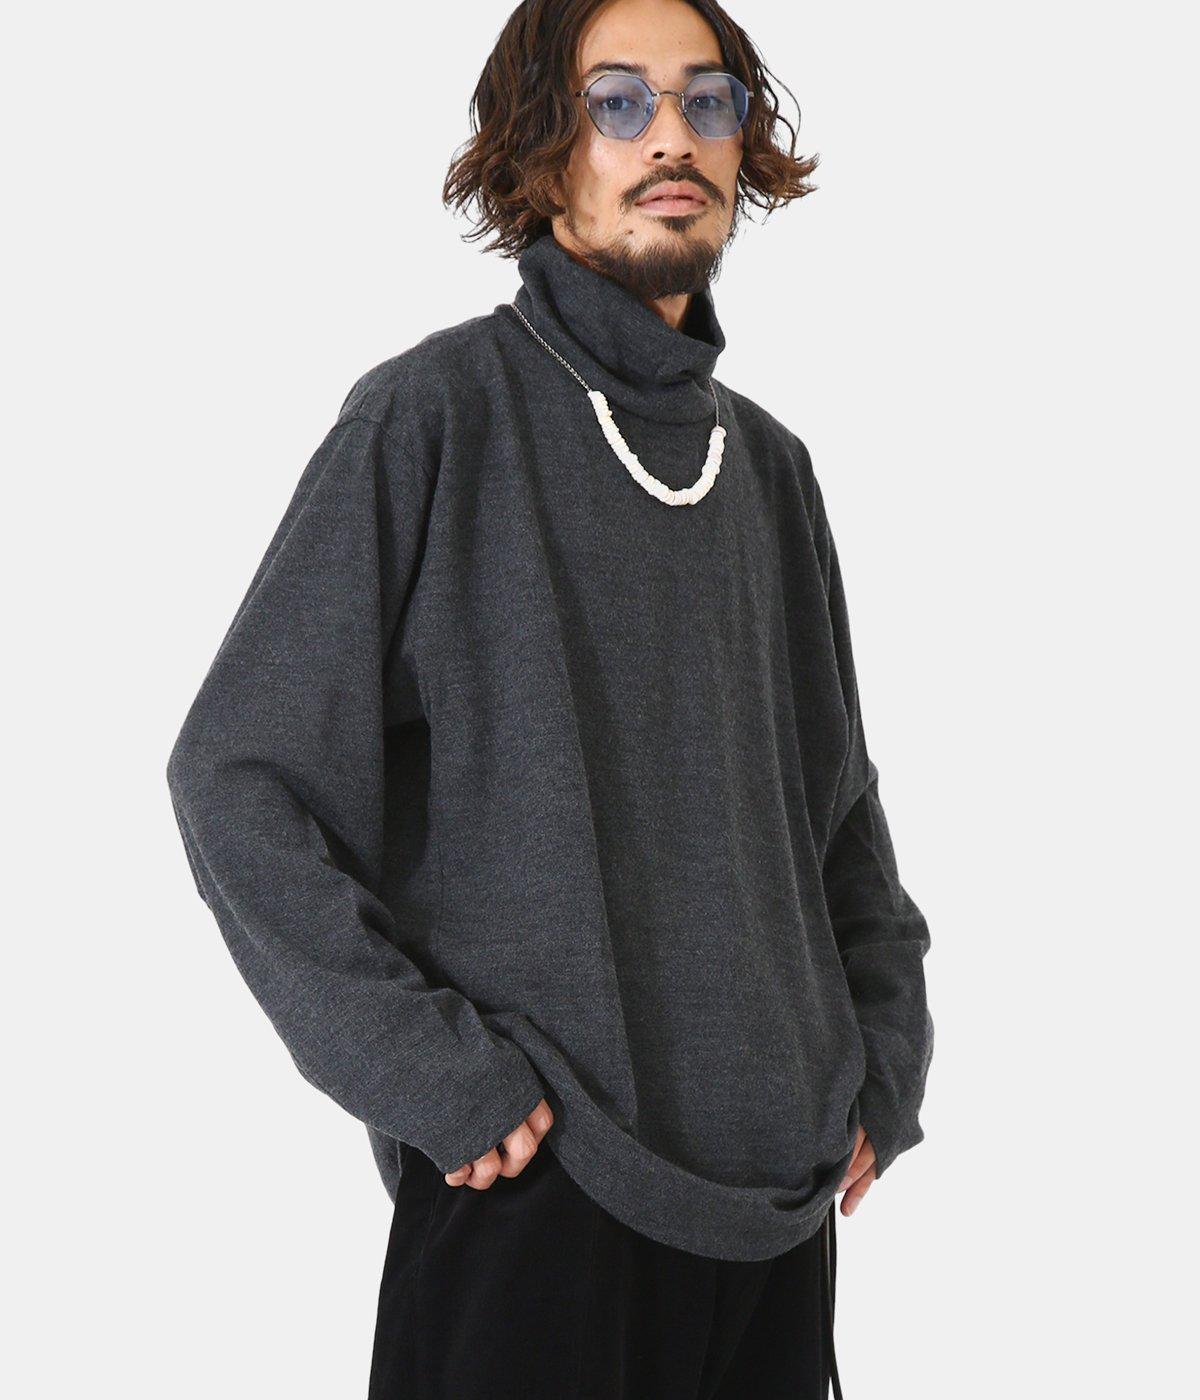 Wool Turtleneck LS T-shirt